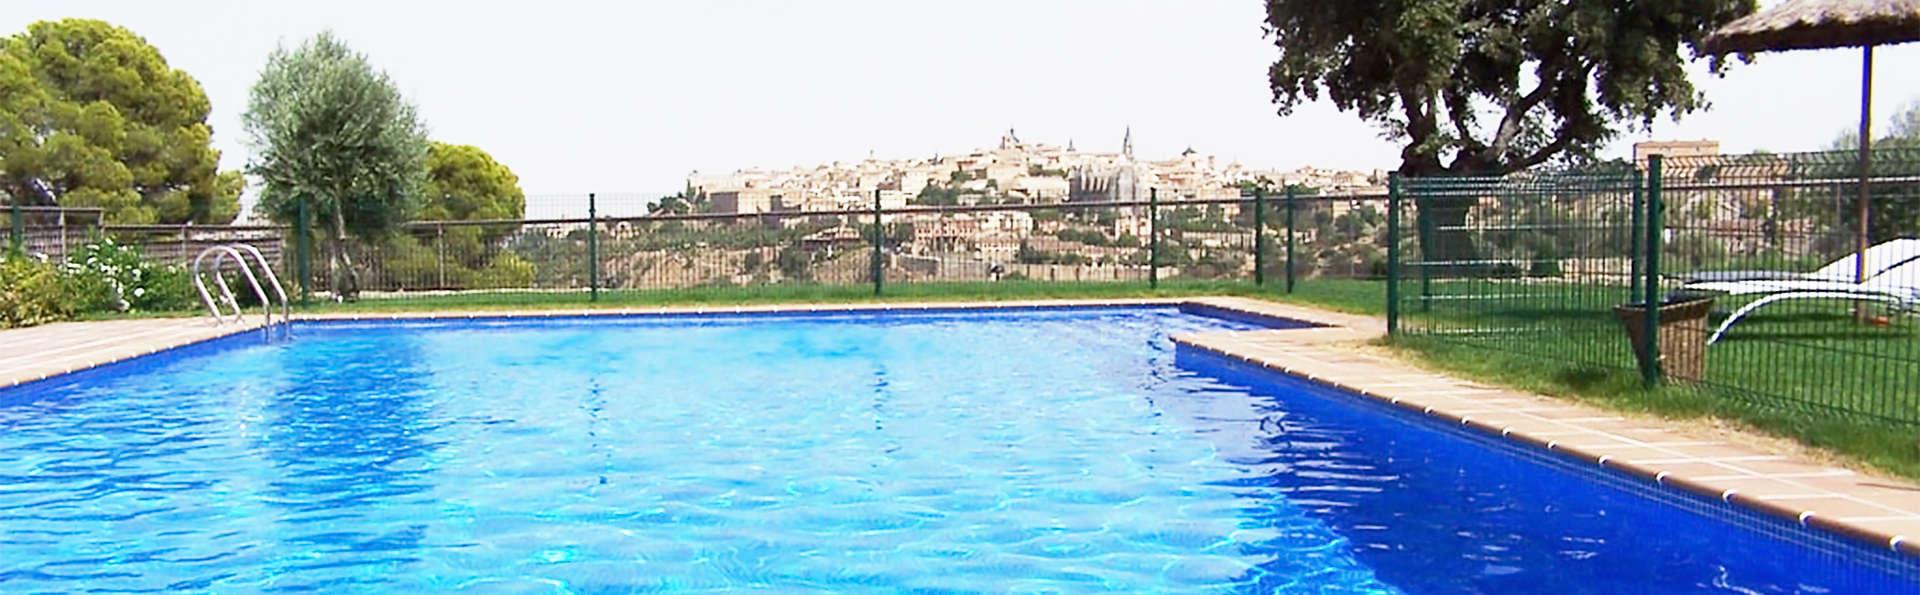 Hotel Cigarral El Bosque - EDIT_pool1.jpg